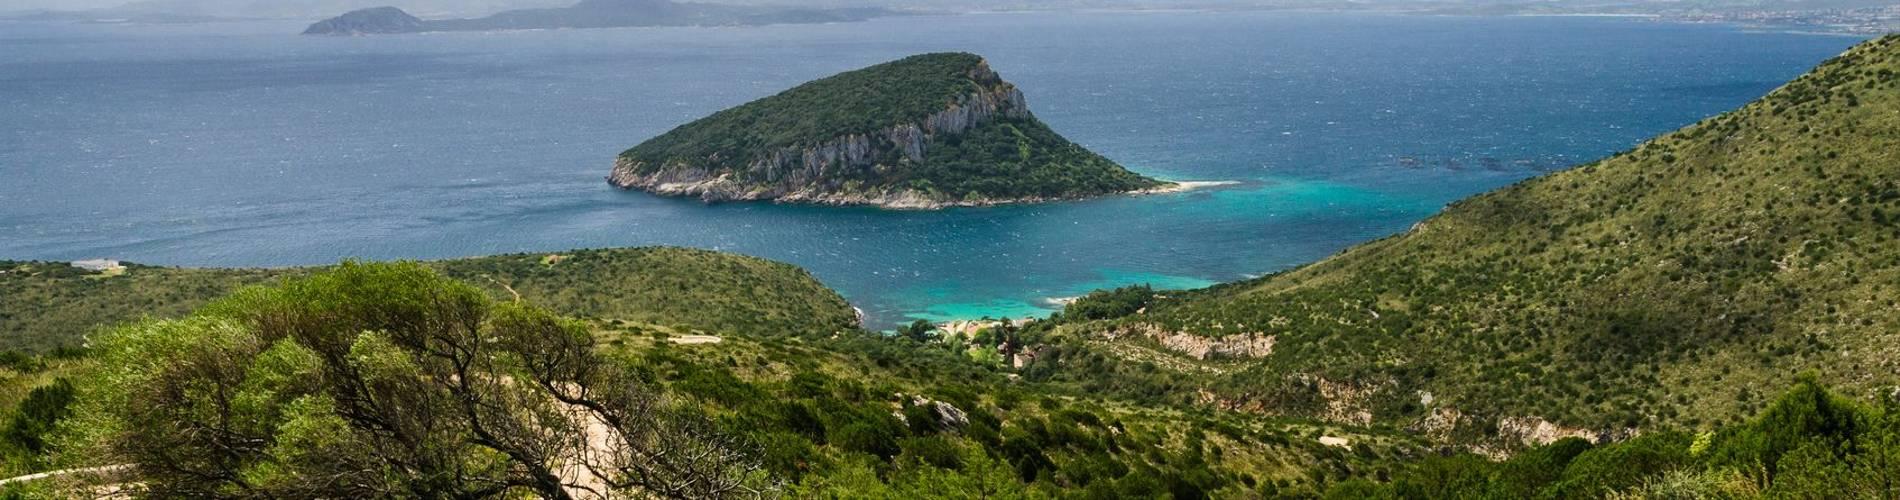 Panoramic view of Capo Figari and Figarolo island. People hiking.